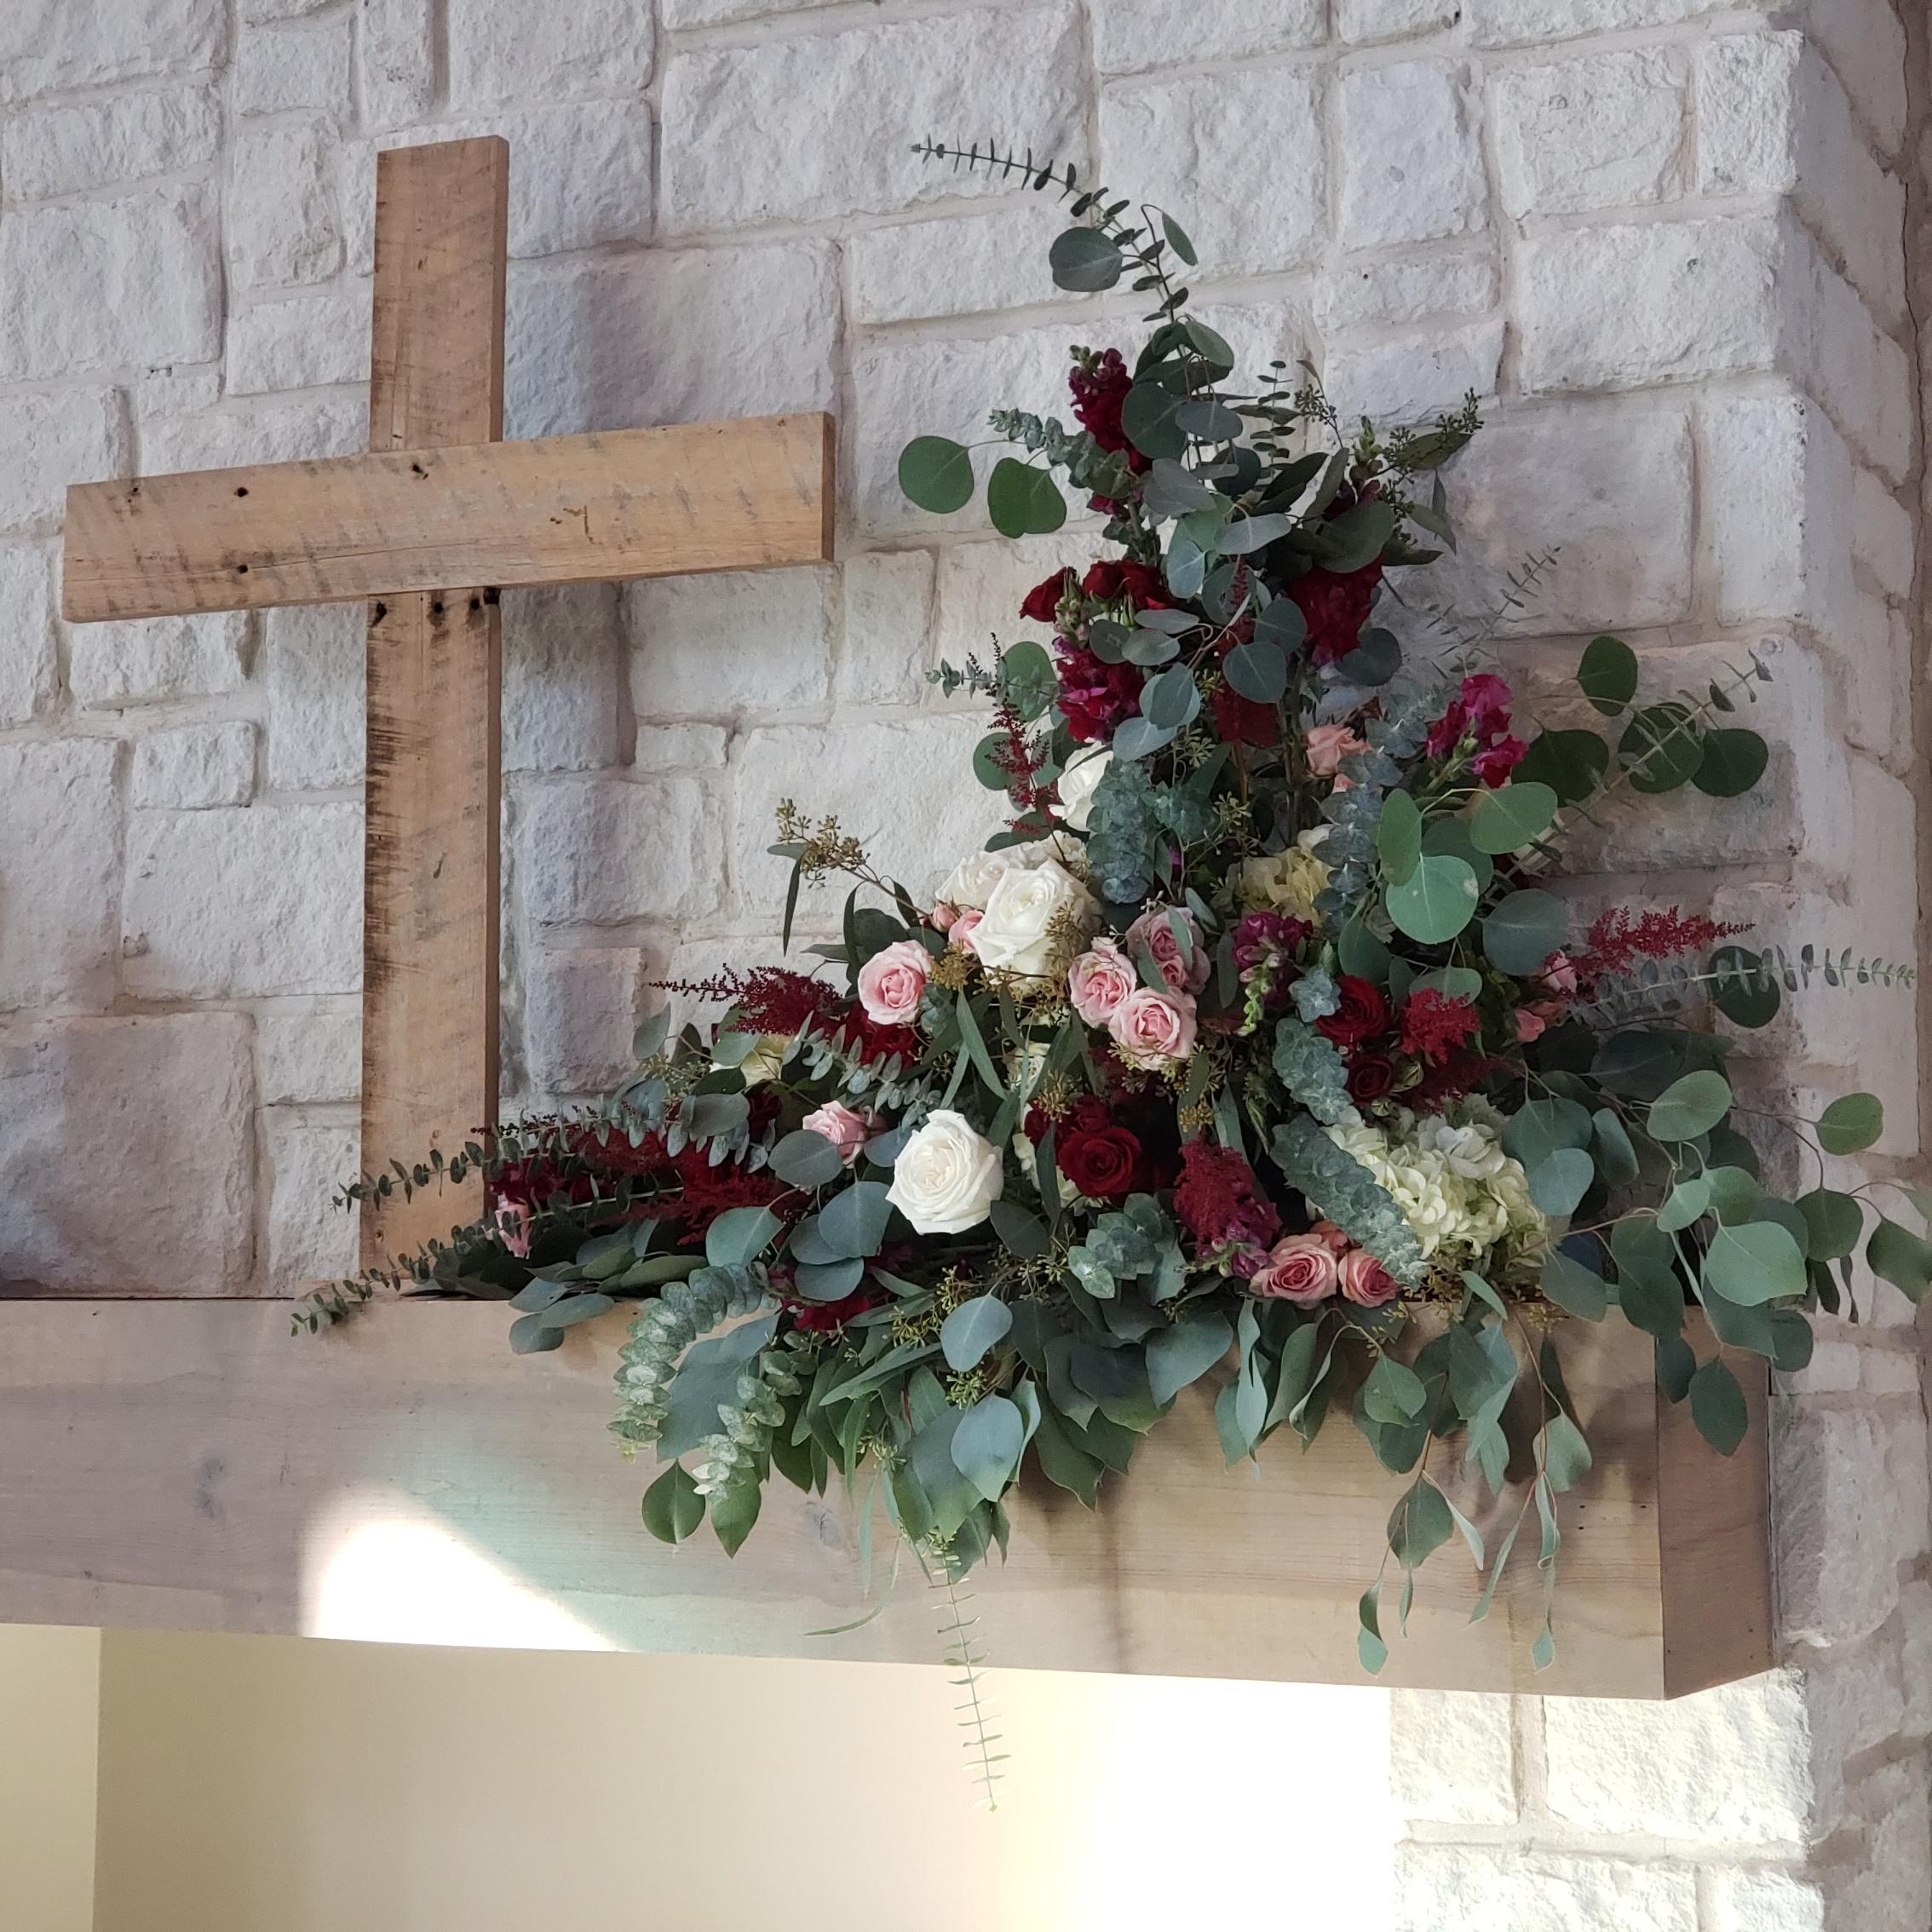 ceremony mantle arrangement.jpg